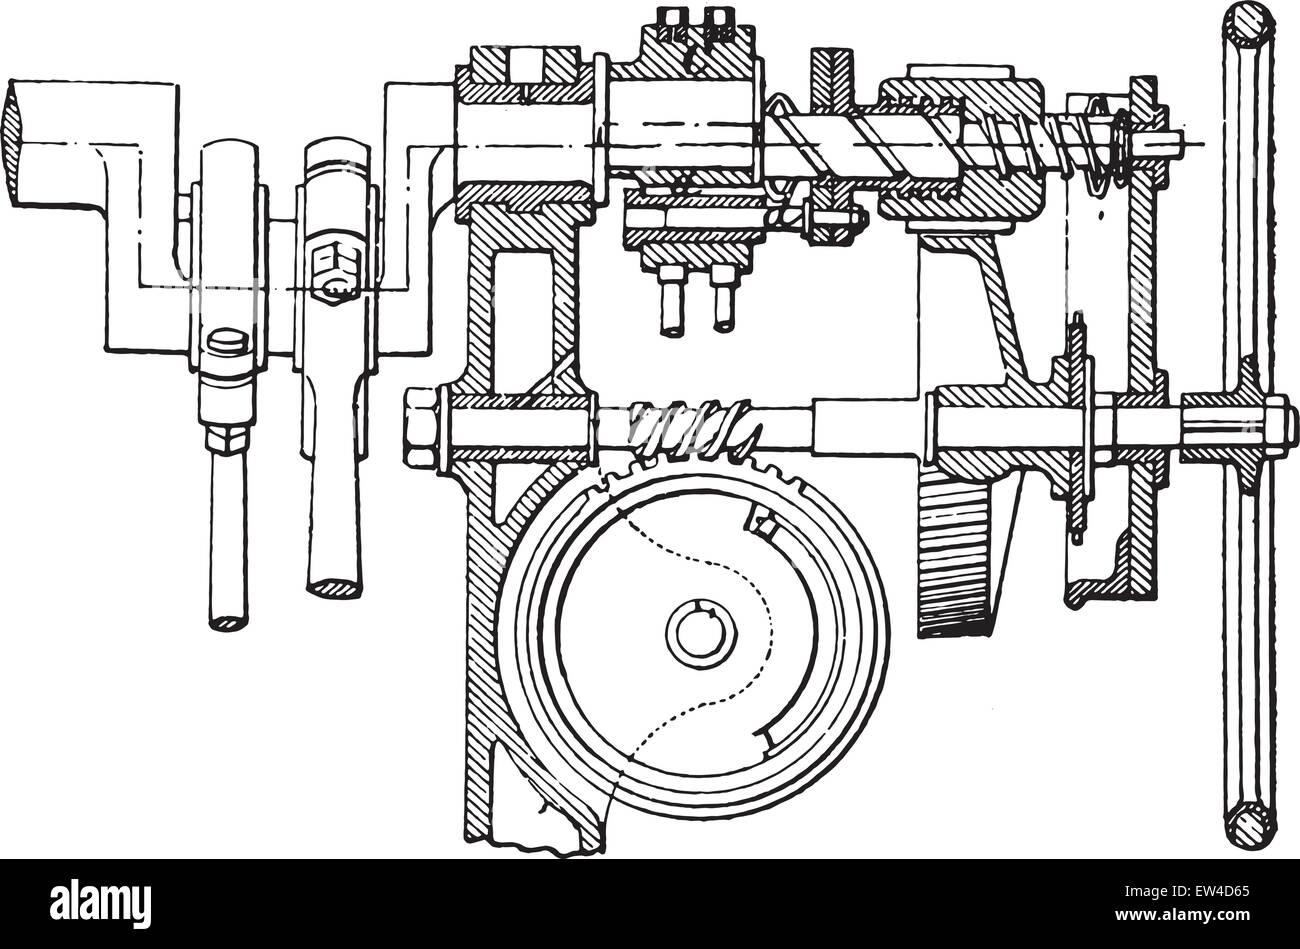 servo stock photos servo stock images alamy Servo System farcot servo winch vintage engraved illustration industrial encyclopedia e o lami